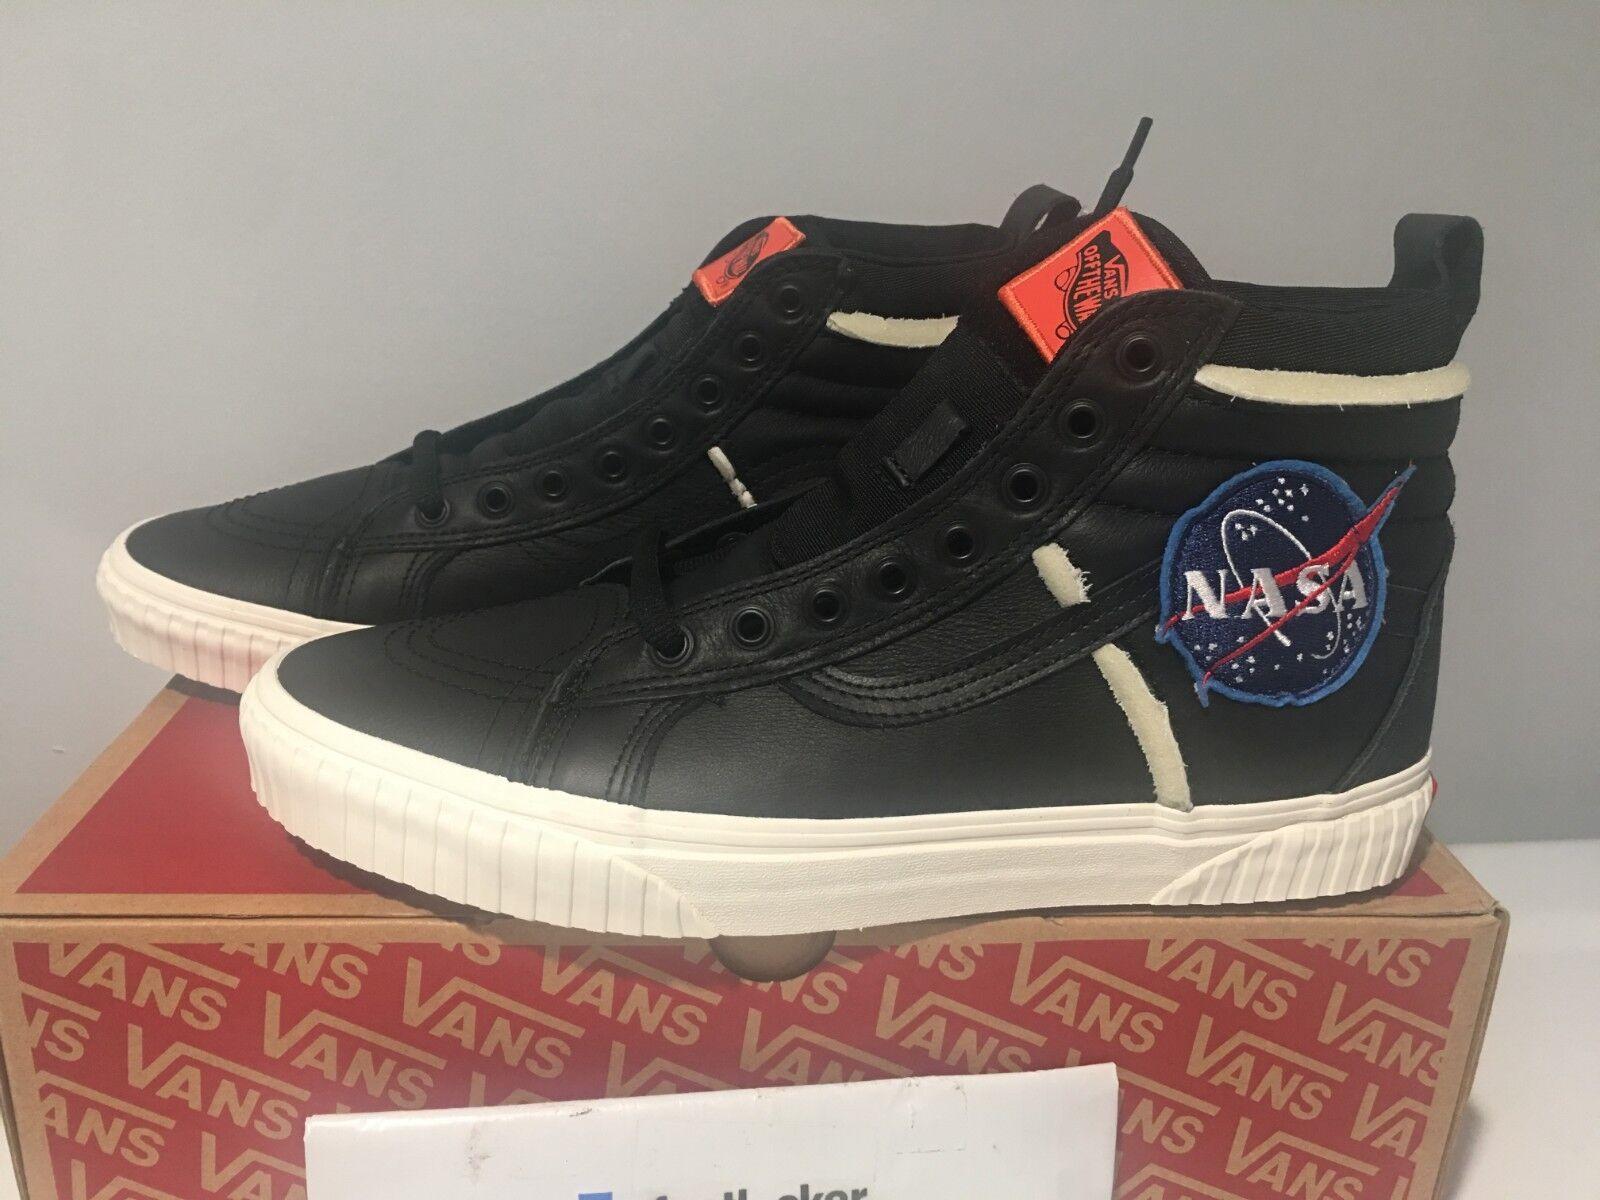 NASA x Vans SK8-Hi 46 All Weather MTE DX Voyager Noir USA Homme Taille 8-13 limitée